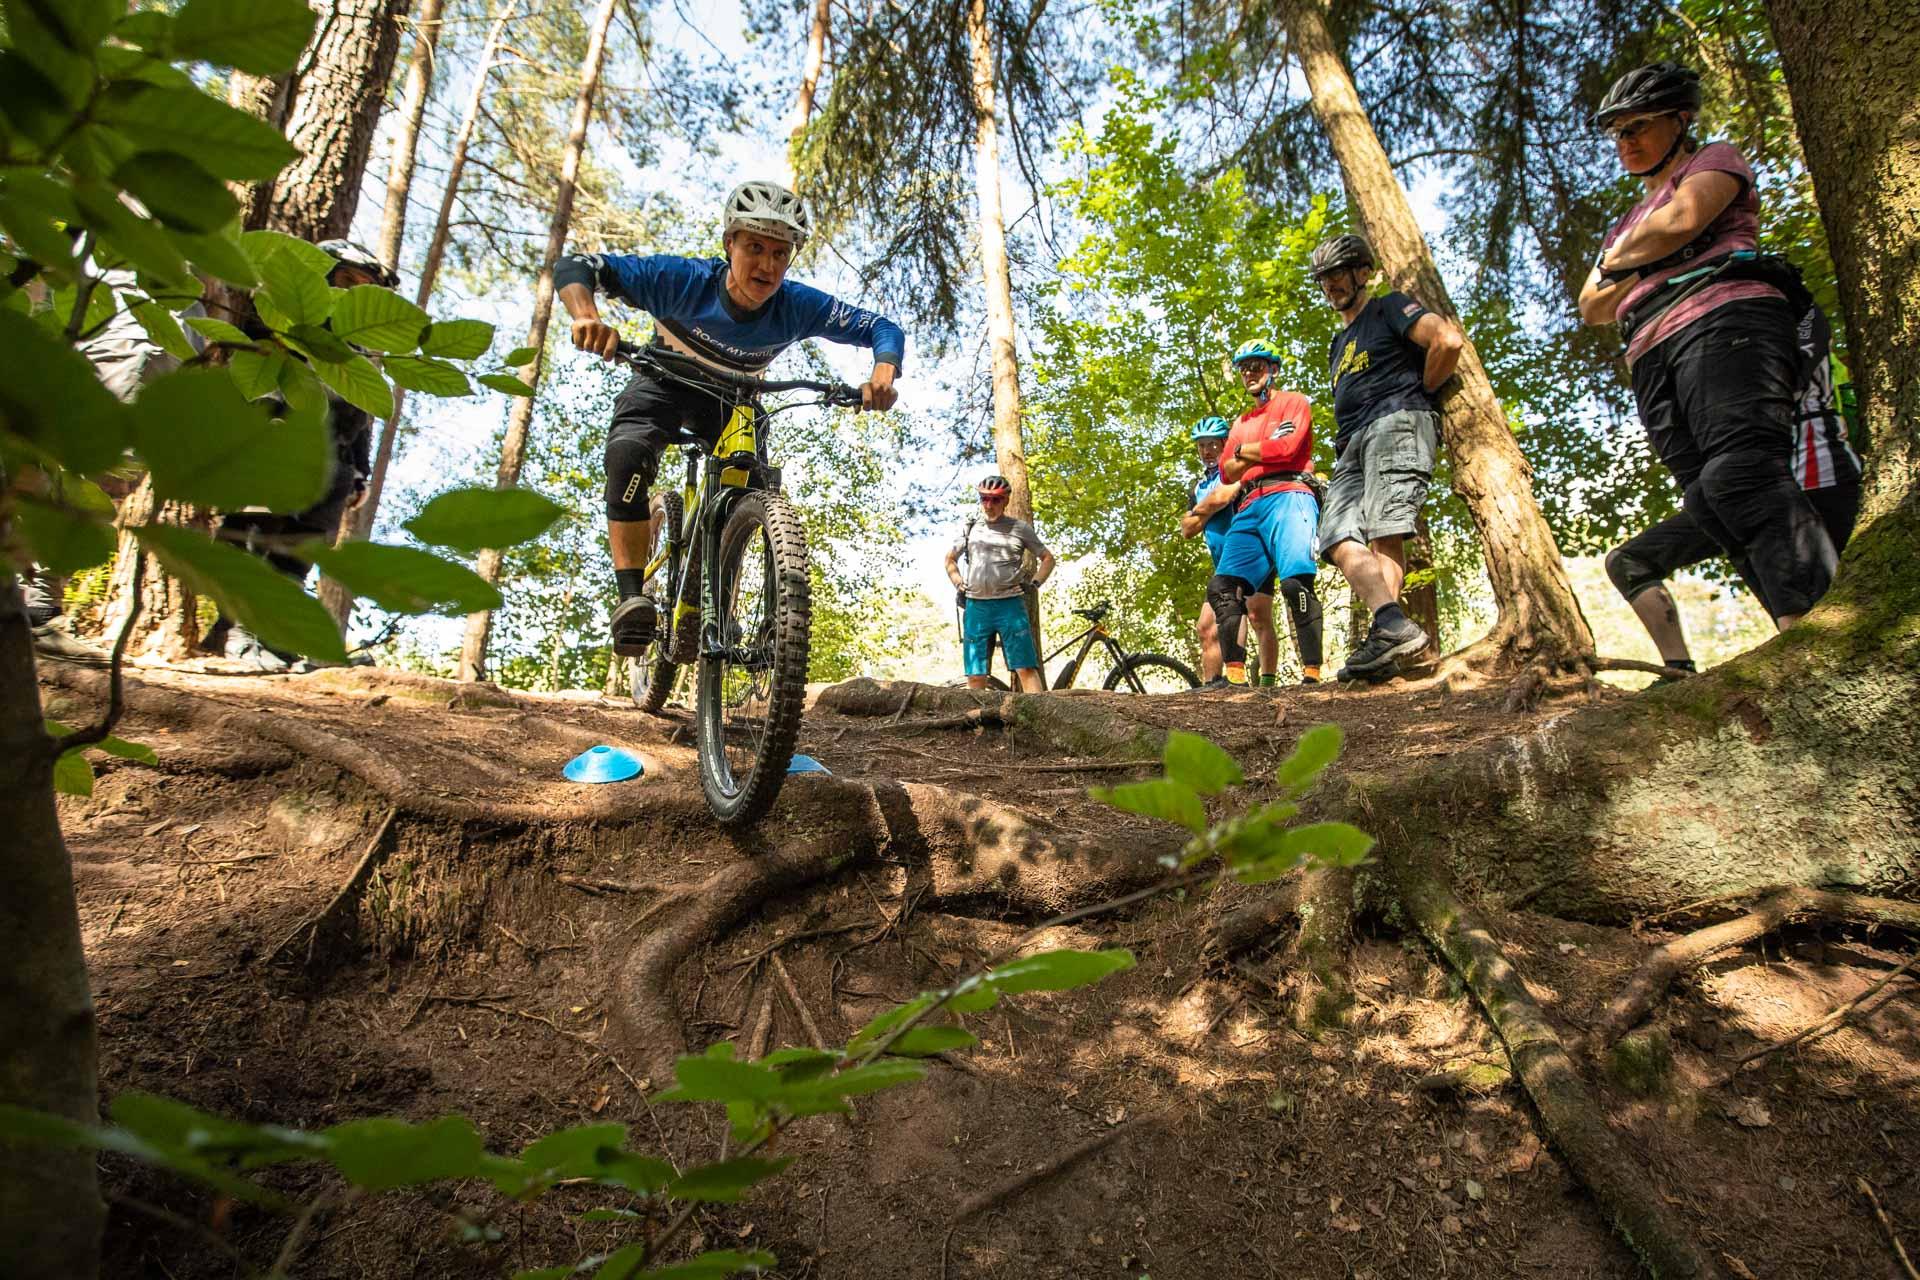 eMTB eBike Fortgeschritten Fahrtechnik Kurs in Siegen - Rock my Trail Bikeschule322